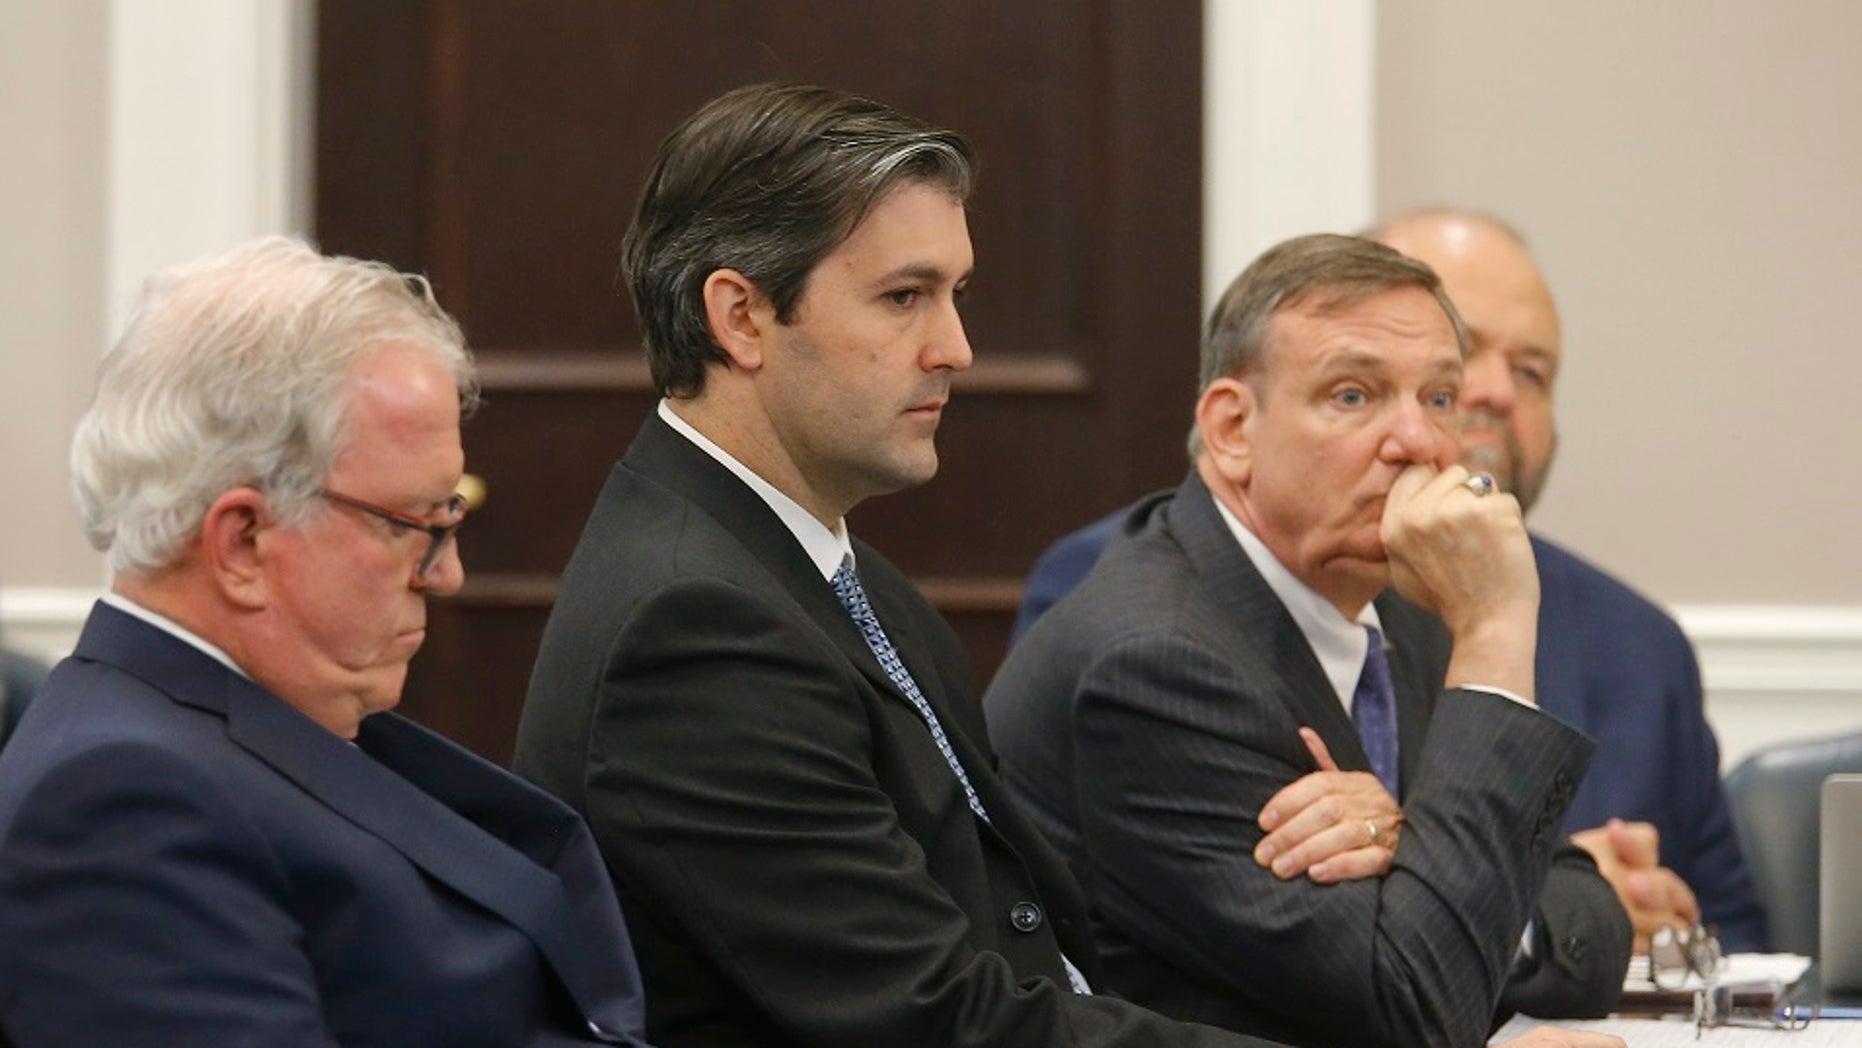 The sentencing hearing for former North Charleston police officer Michael Slager began on Dec. 4.